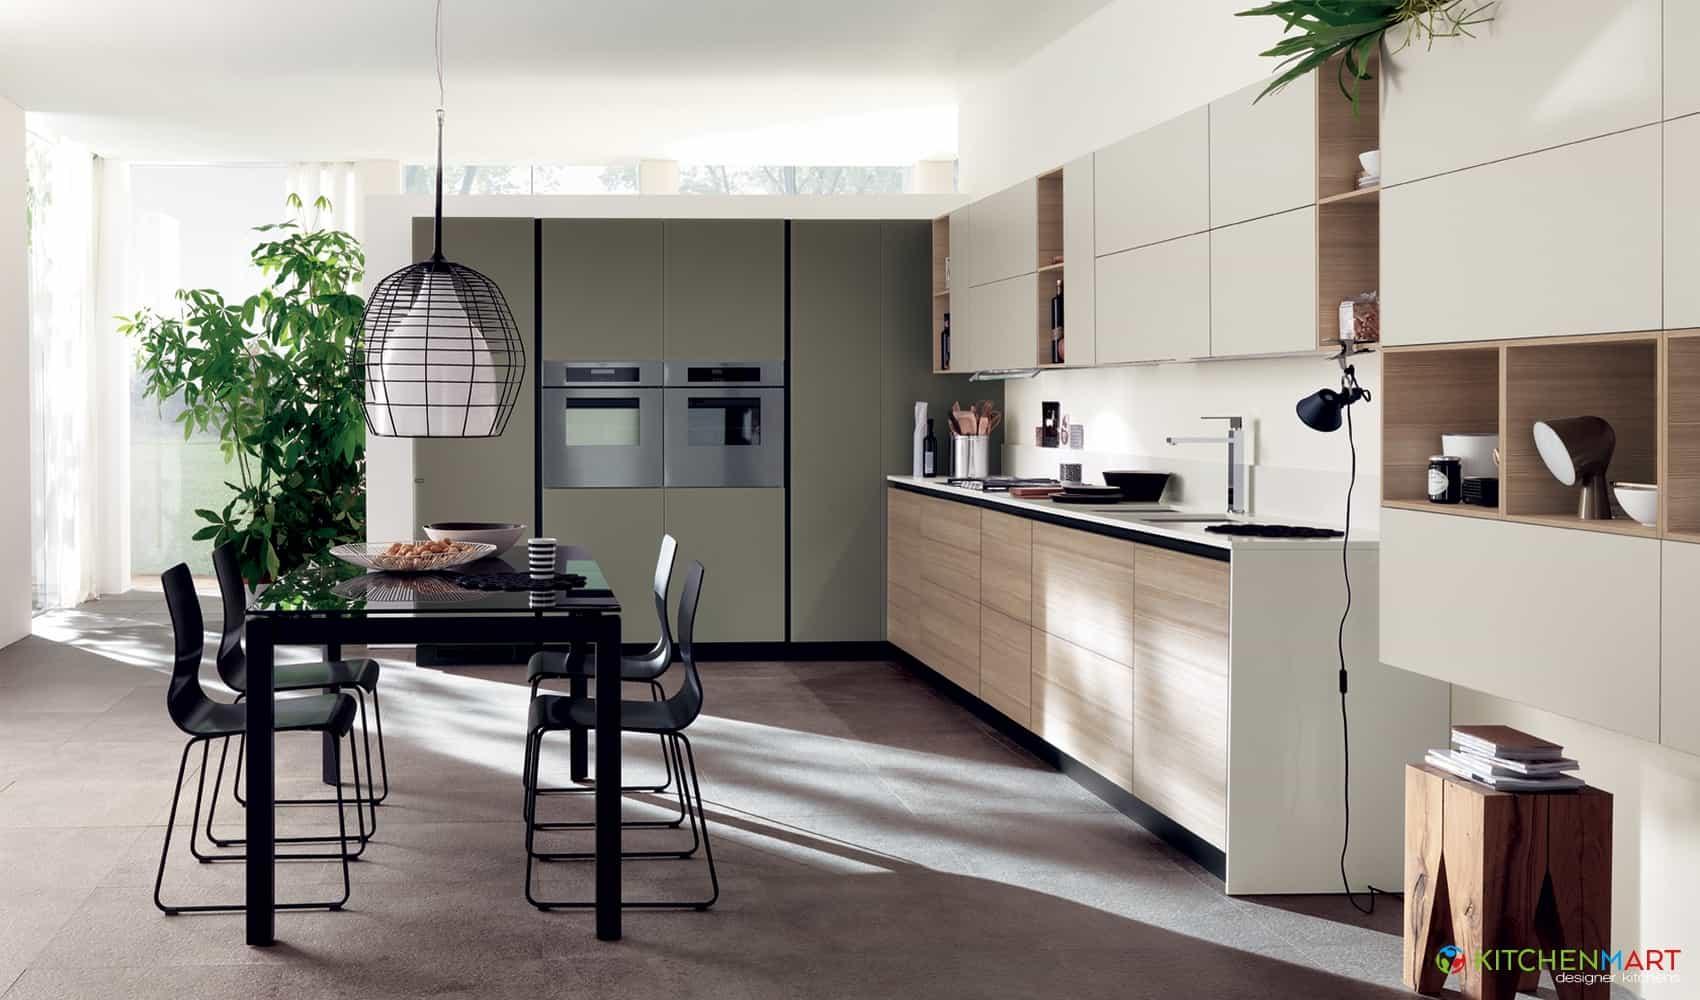 Contemporary Kitchens Melbourne Kitchen Mart Kitchen Renovations